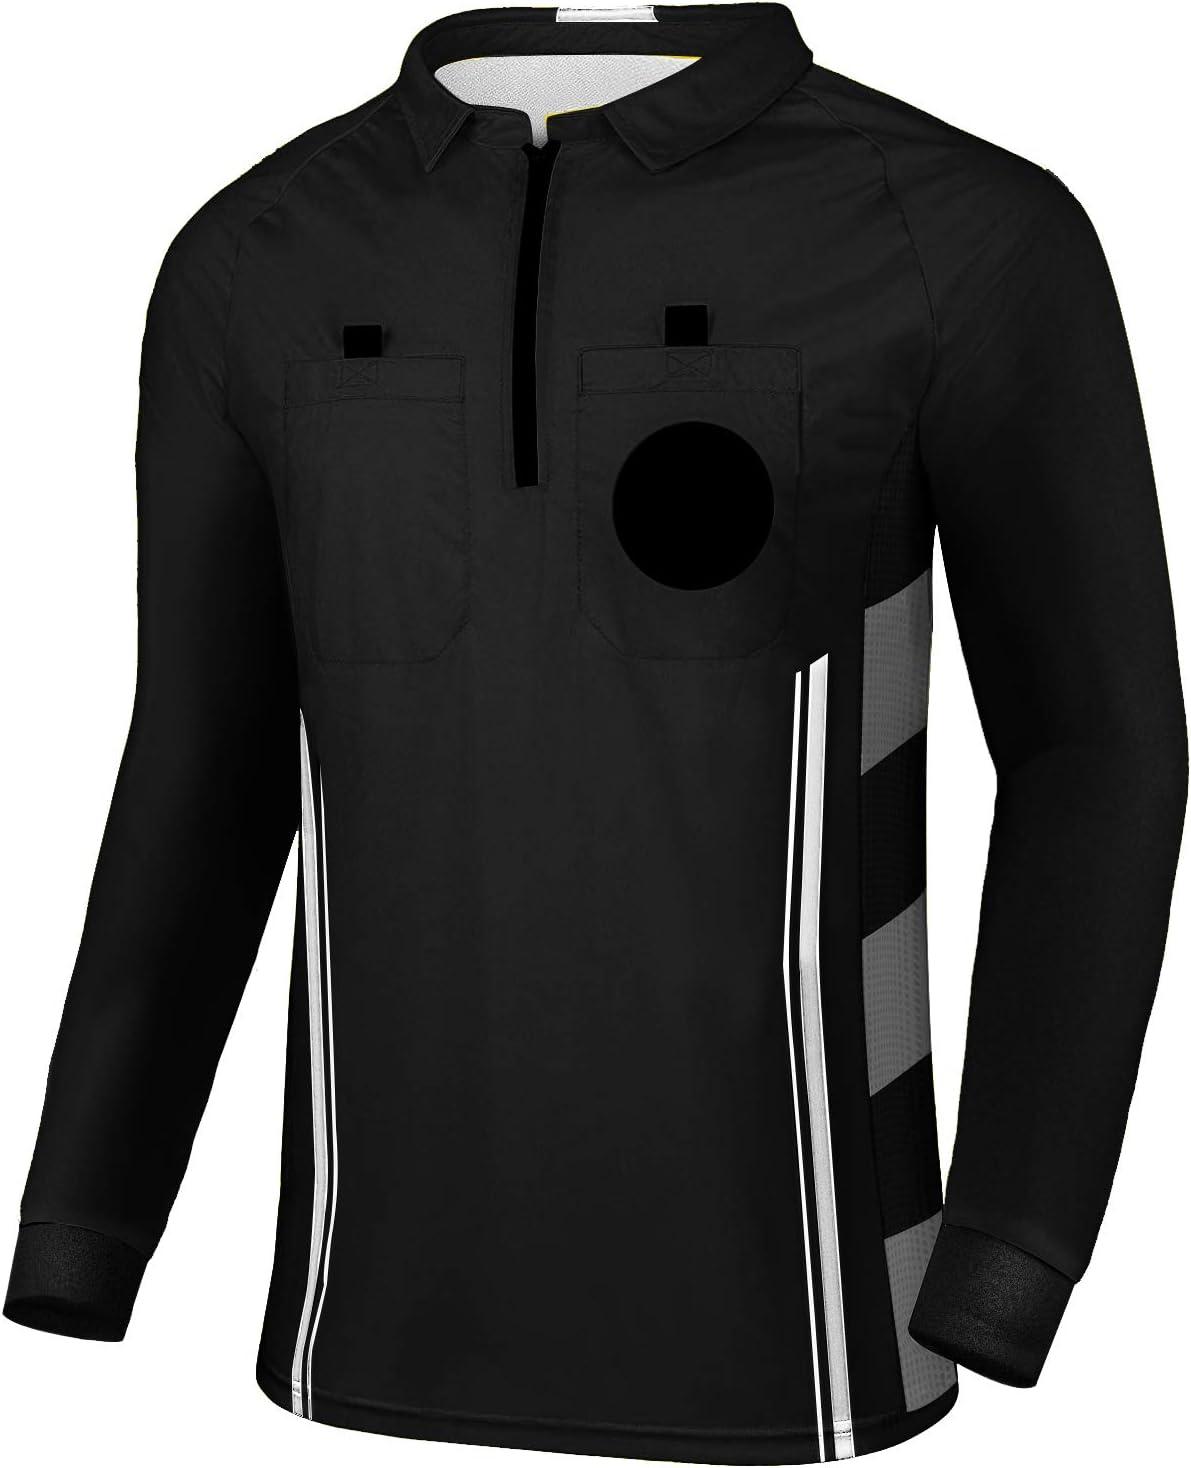 Yuar USSF Pro Soccer Long Sleeve Referee Shirt